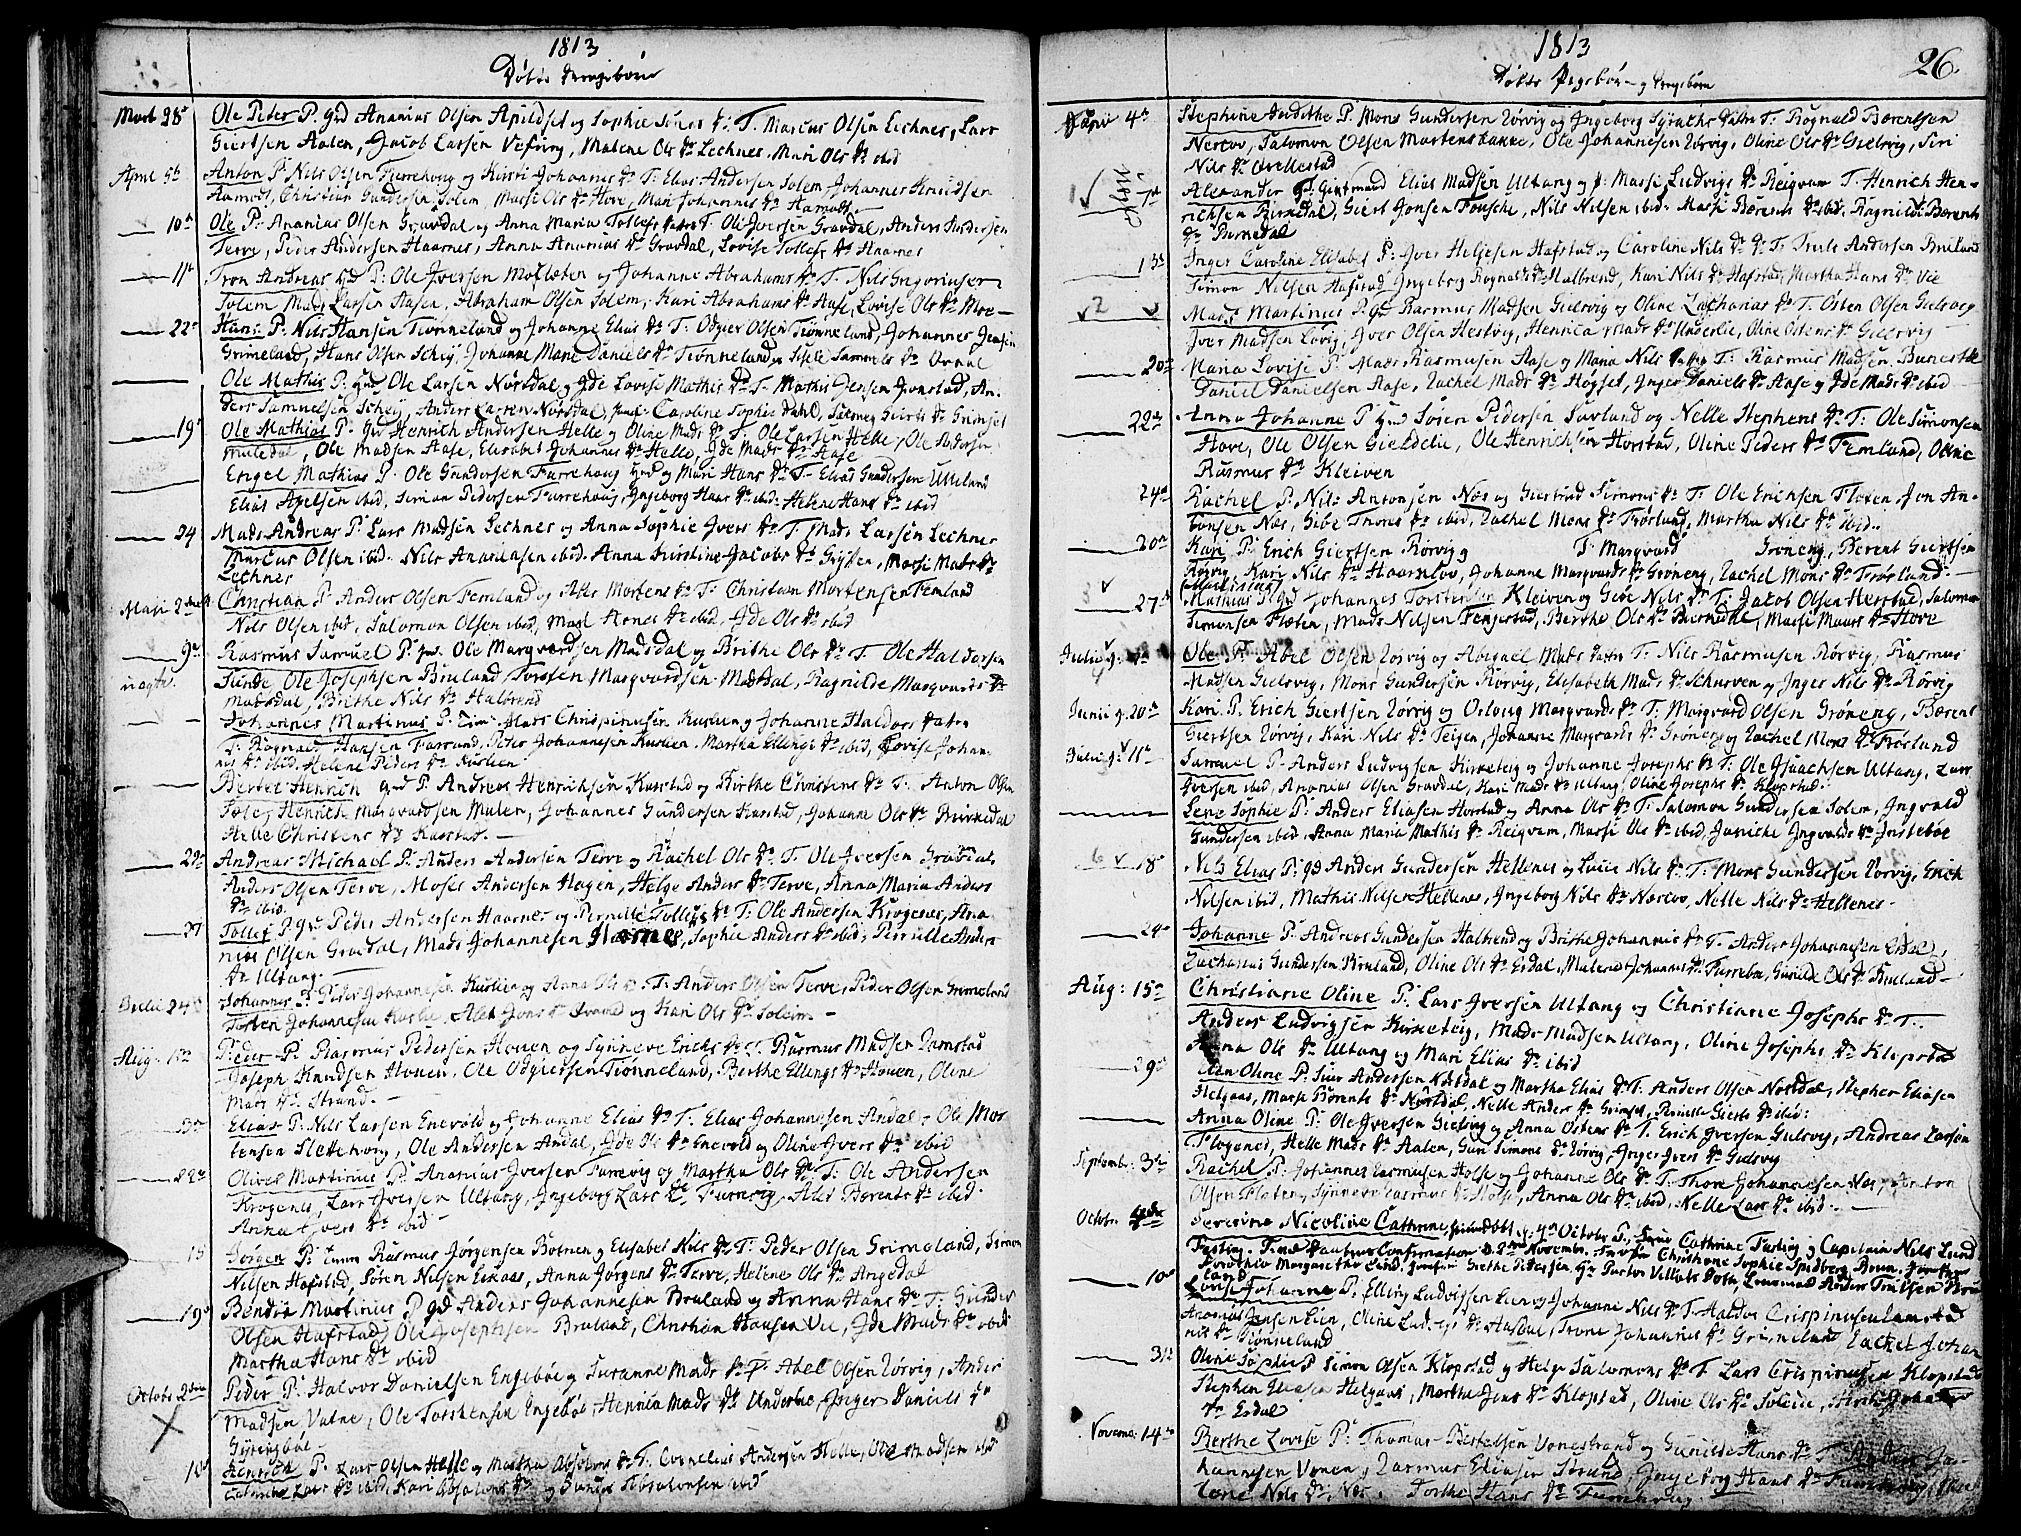 SAB, Førde Sokneprestembete, H/Haa: Ministerialbok nr. A 5, 1803-1821, s. 26